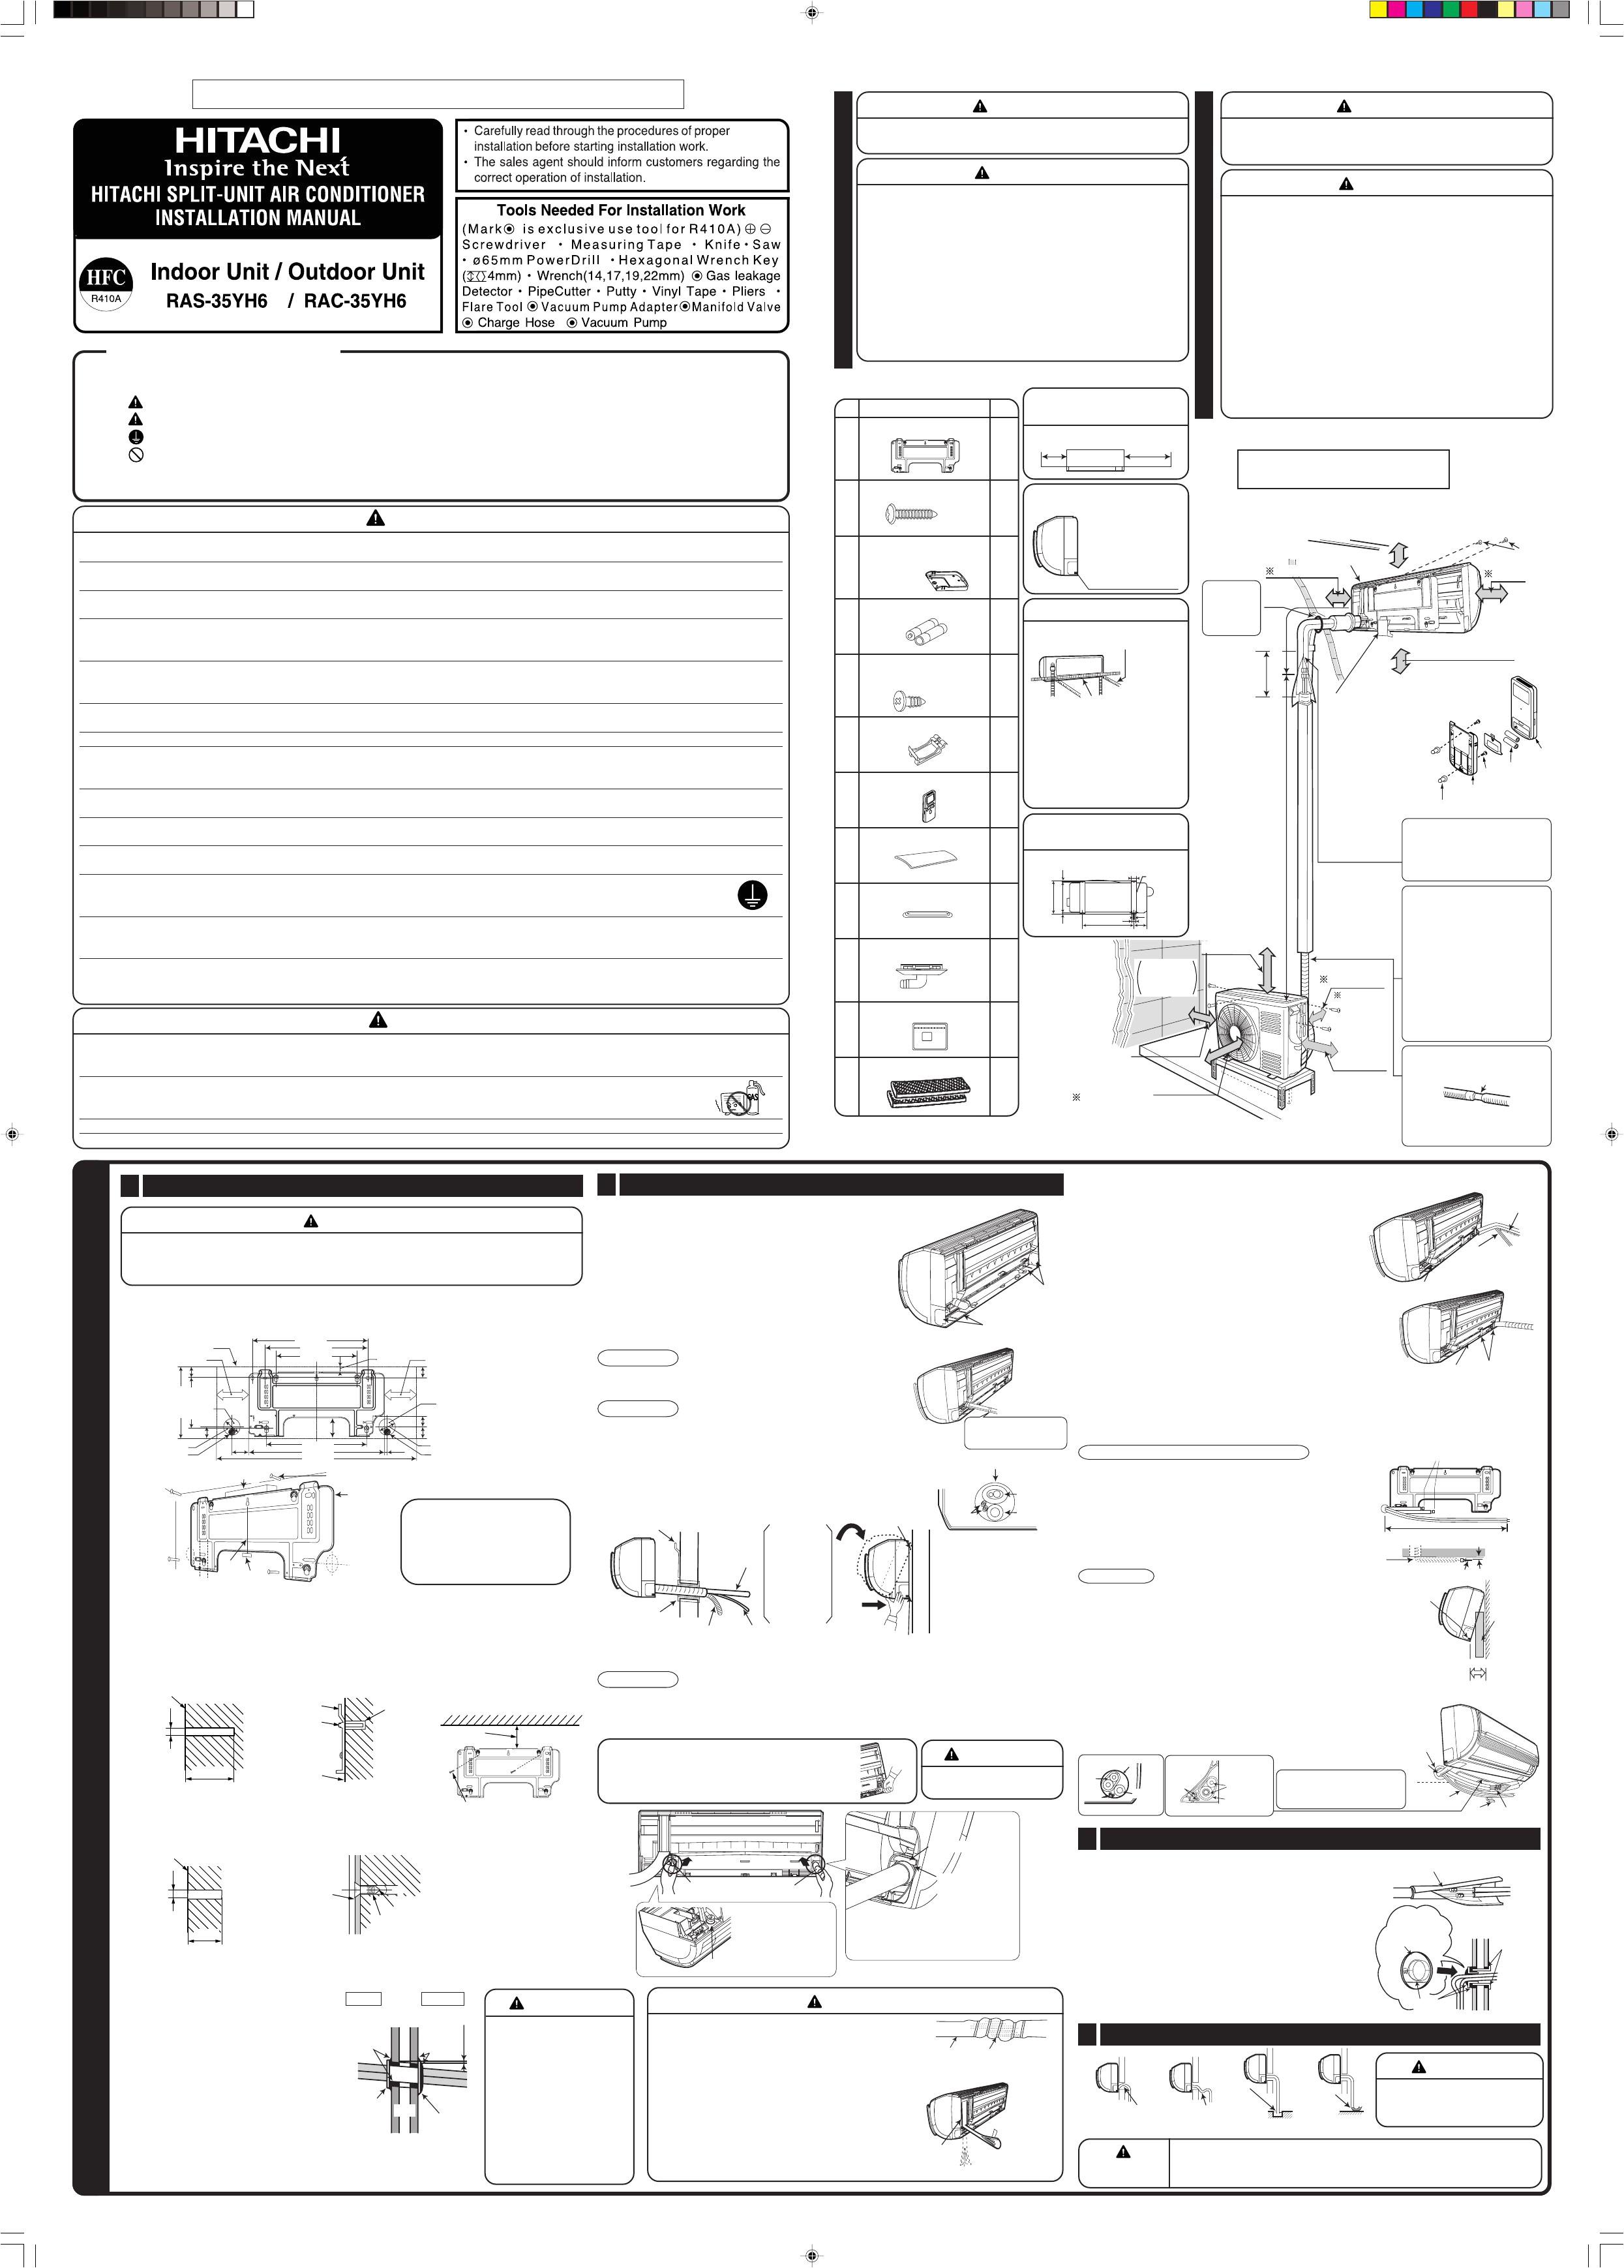 intelilite amf 25 wiring diagram lovely caterpillar manual ebook